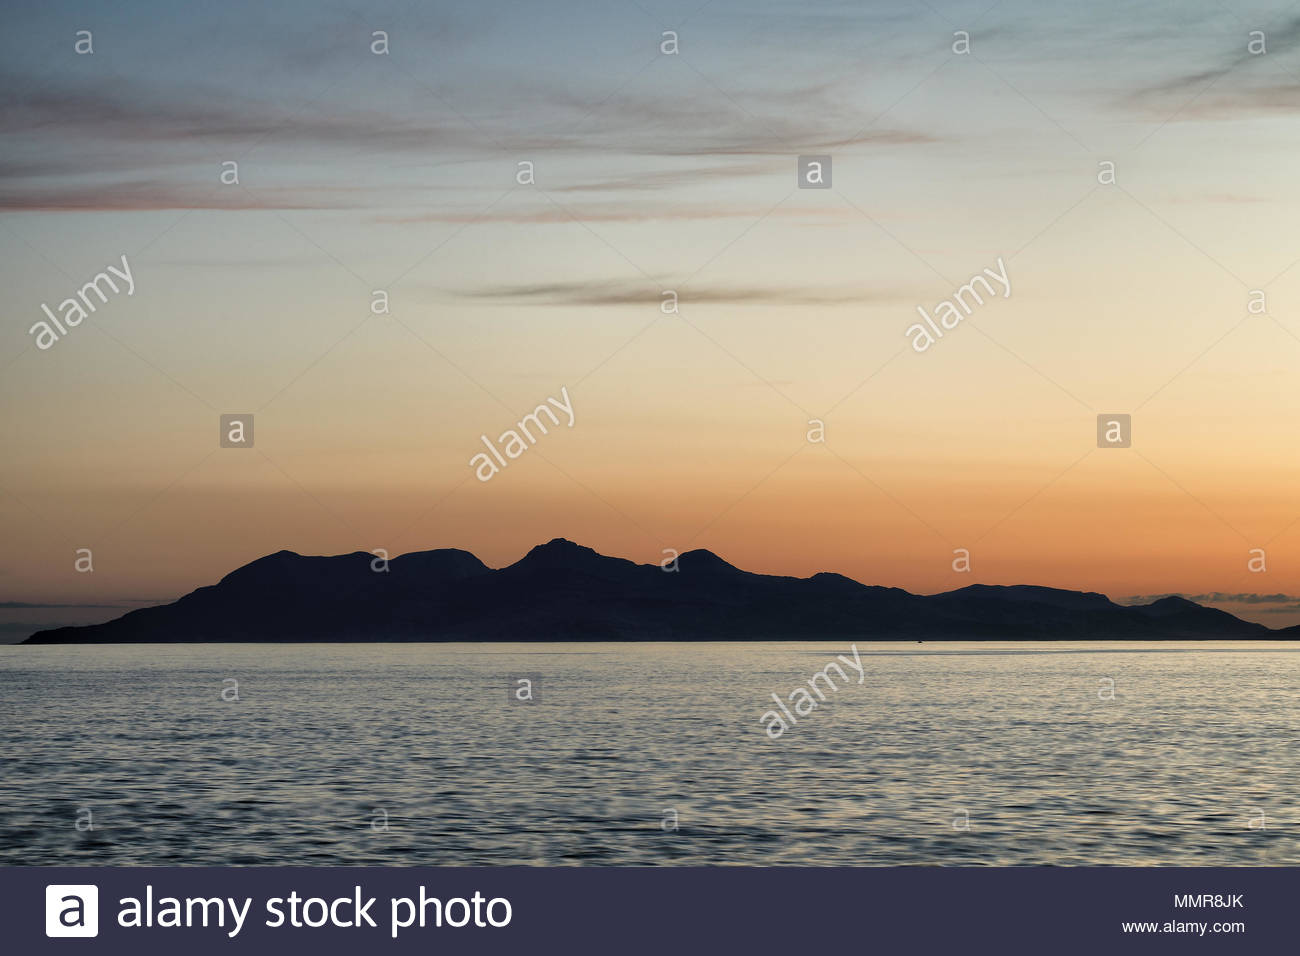 Isle of Eigg Sunset from Mallaig, Scotland. Stock Photo